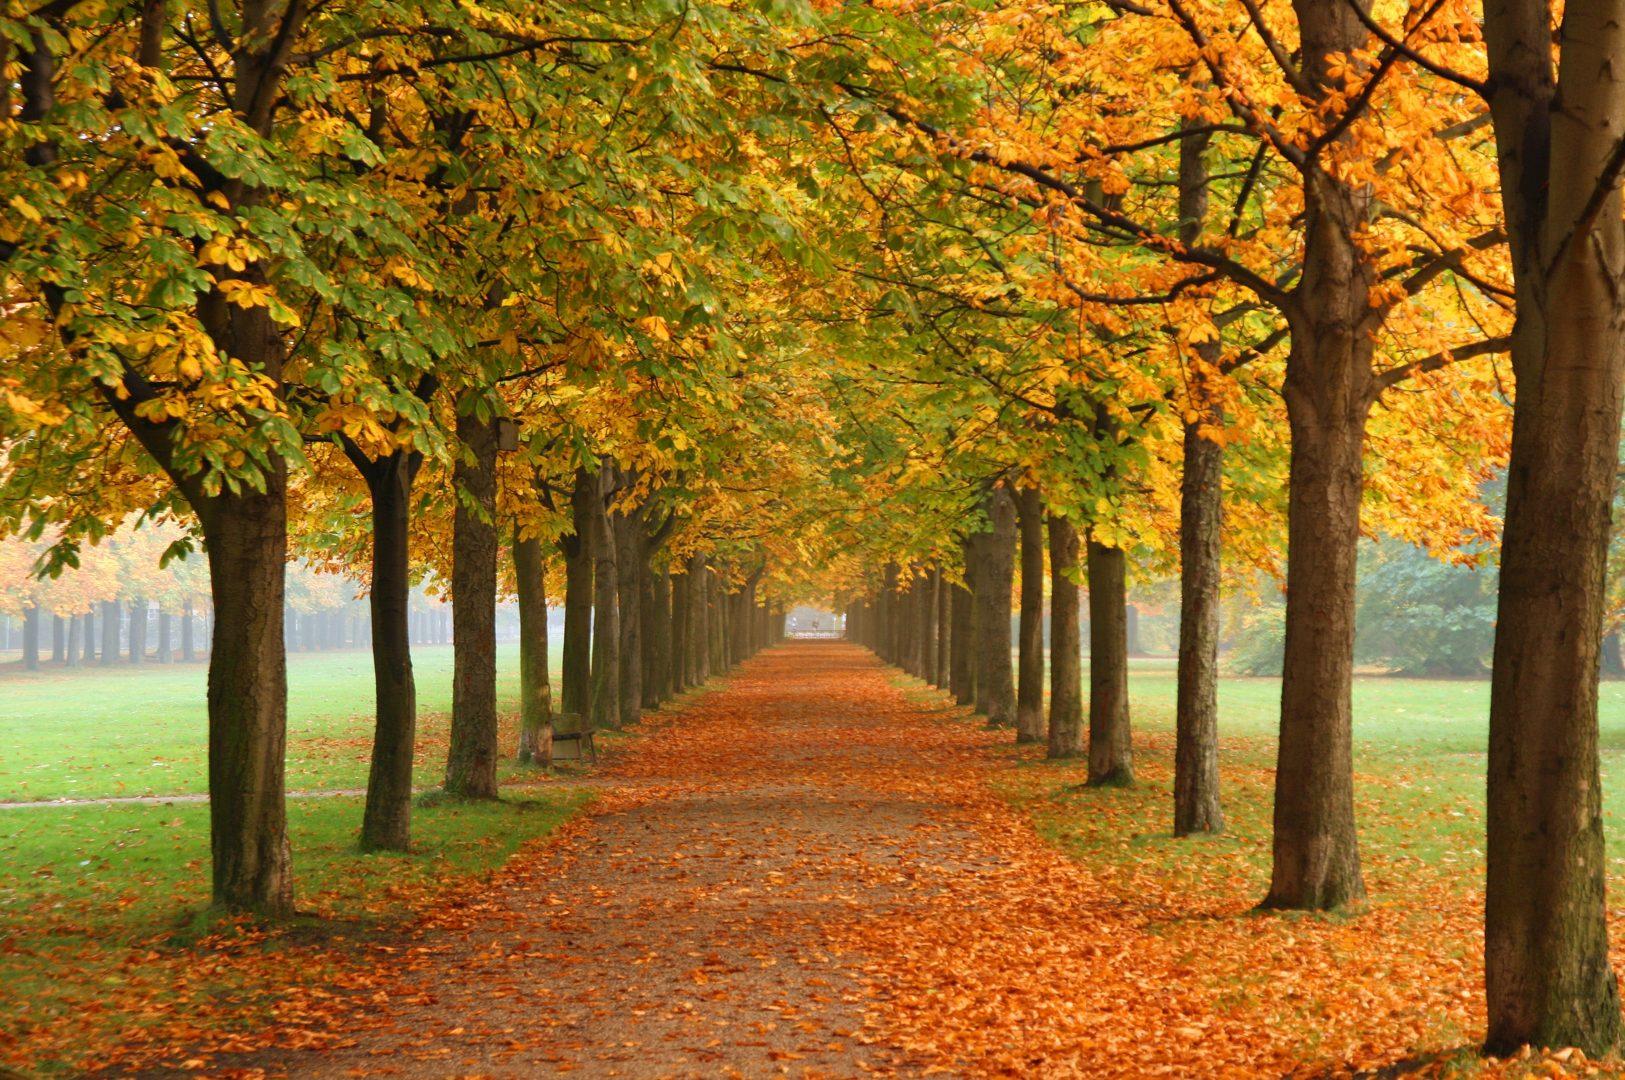 Season's Greetings: The Effect Of Seasonality On Consumer Attitudes